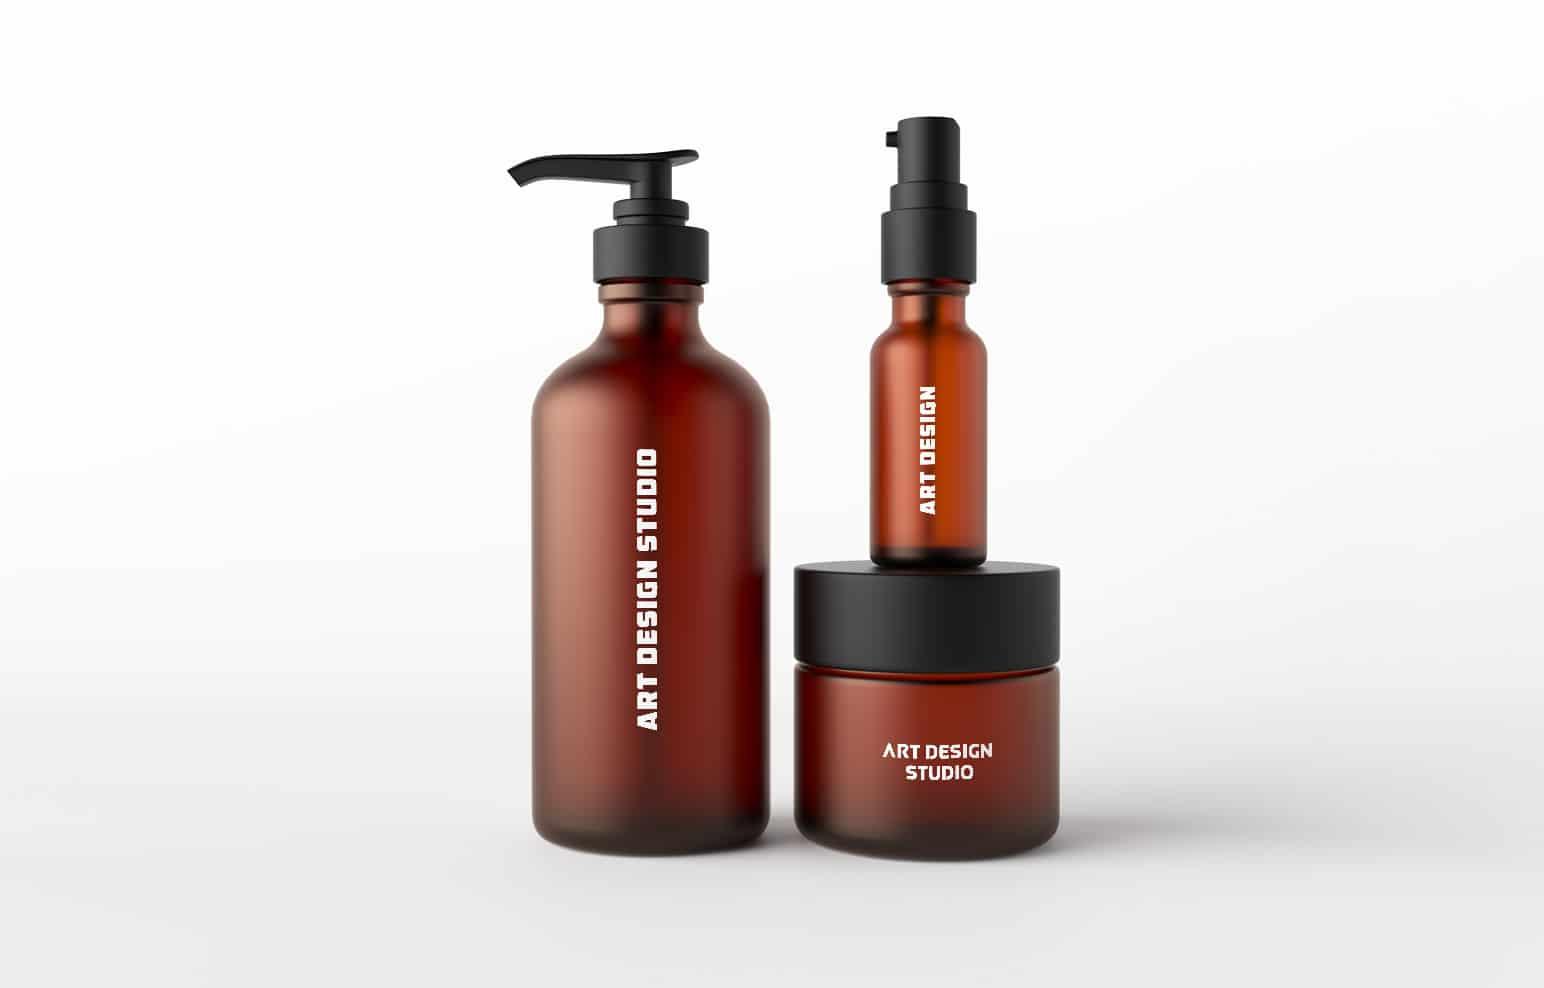 Kreirame dizajni za sekakov tip na kozmeticki proizvodi, Креираме дизајн за секаков тип на козметички производи